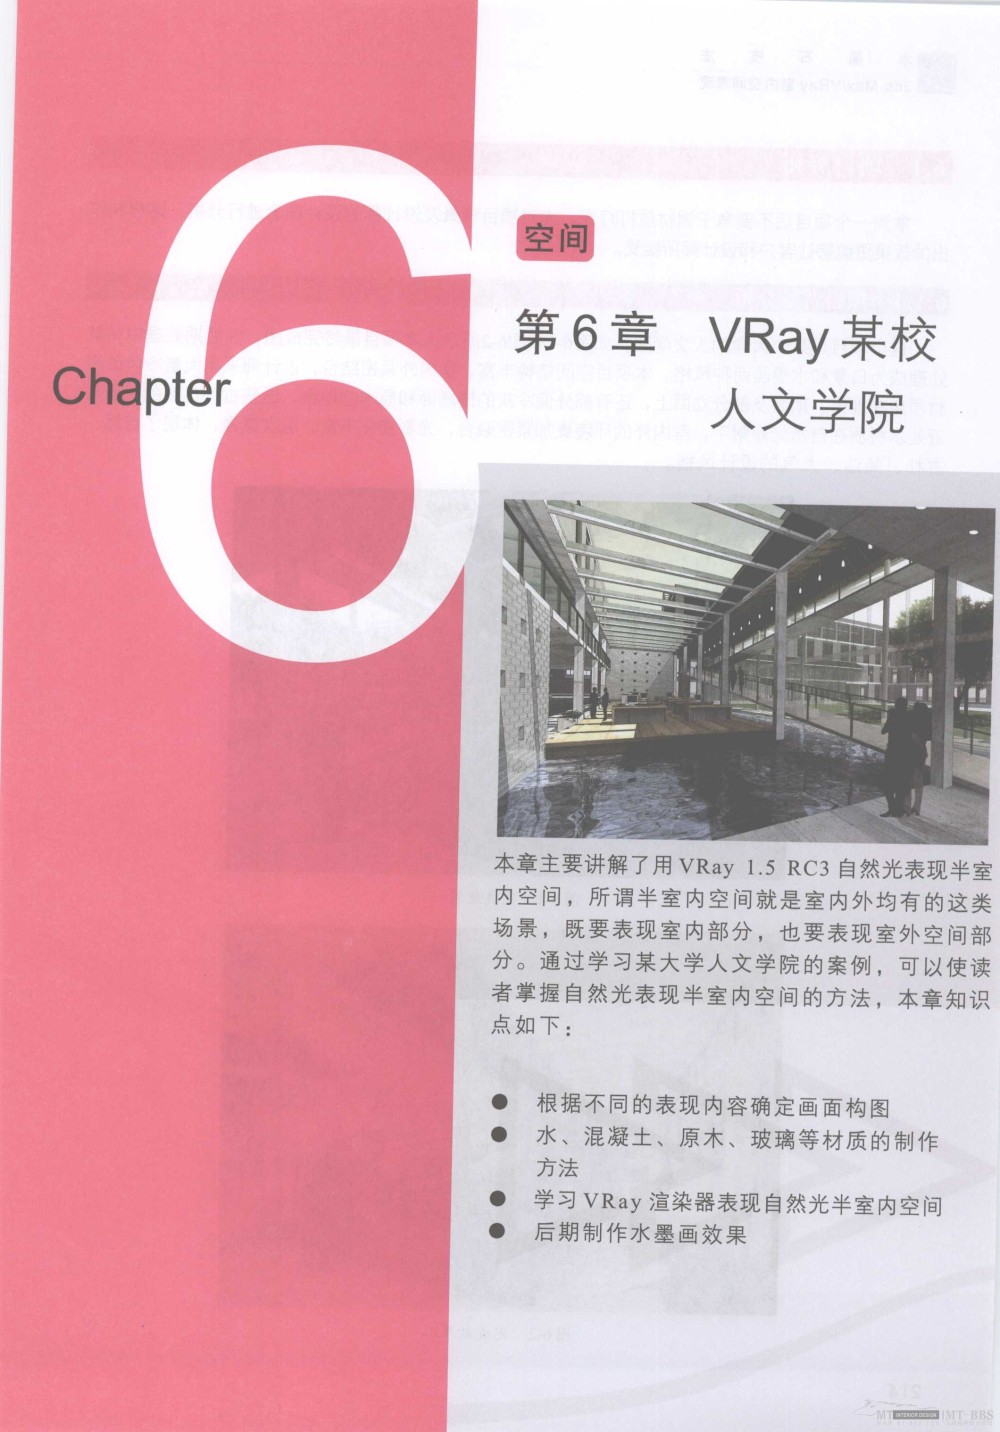 水晶石技法-3ds_Max&VRay室内空间表现_水晶石技法-3ds_Max&VRay室内空间表现_页面_219.jpg